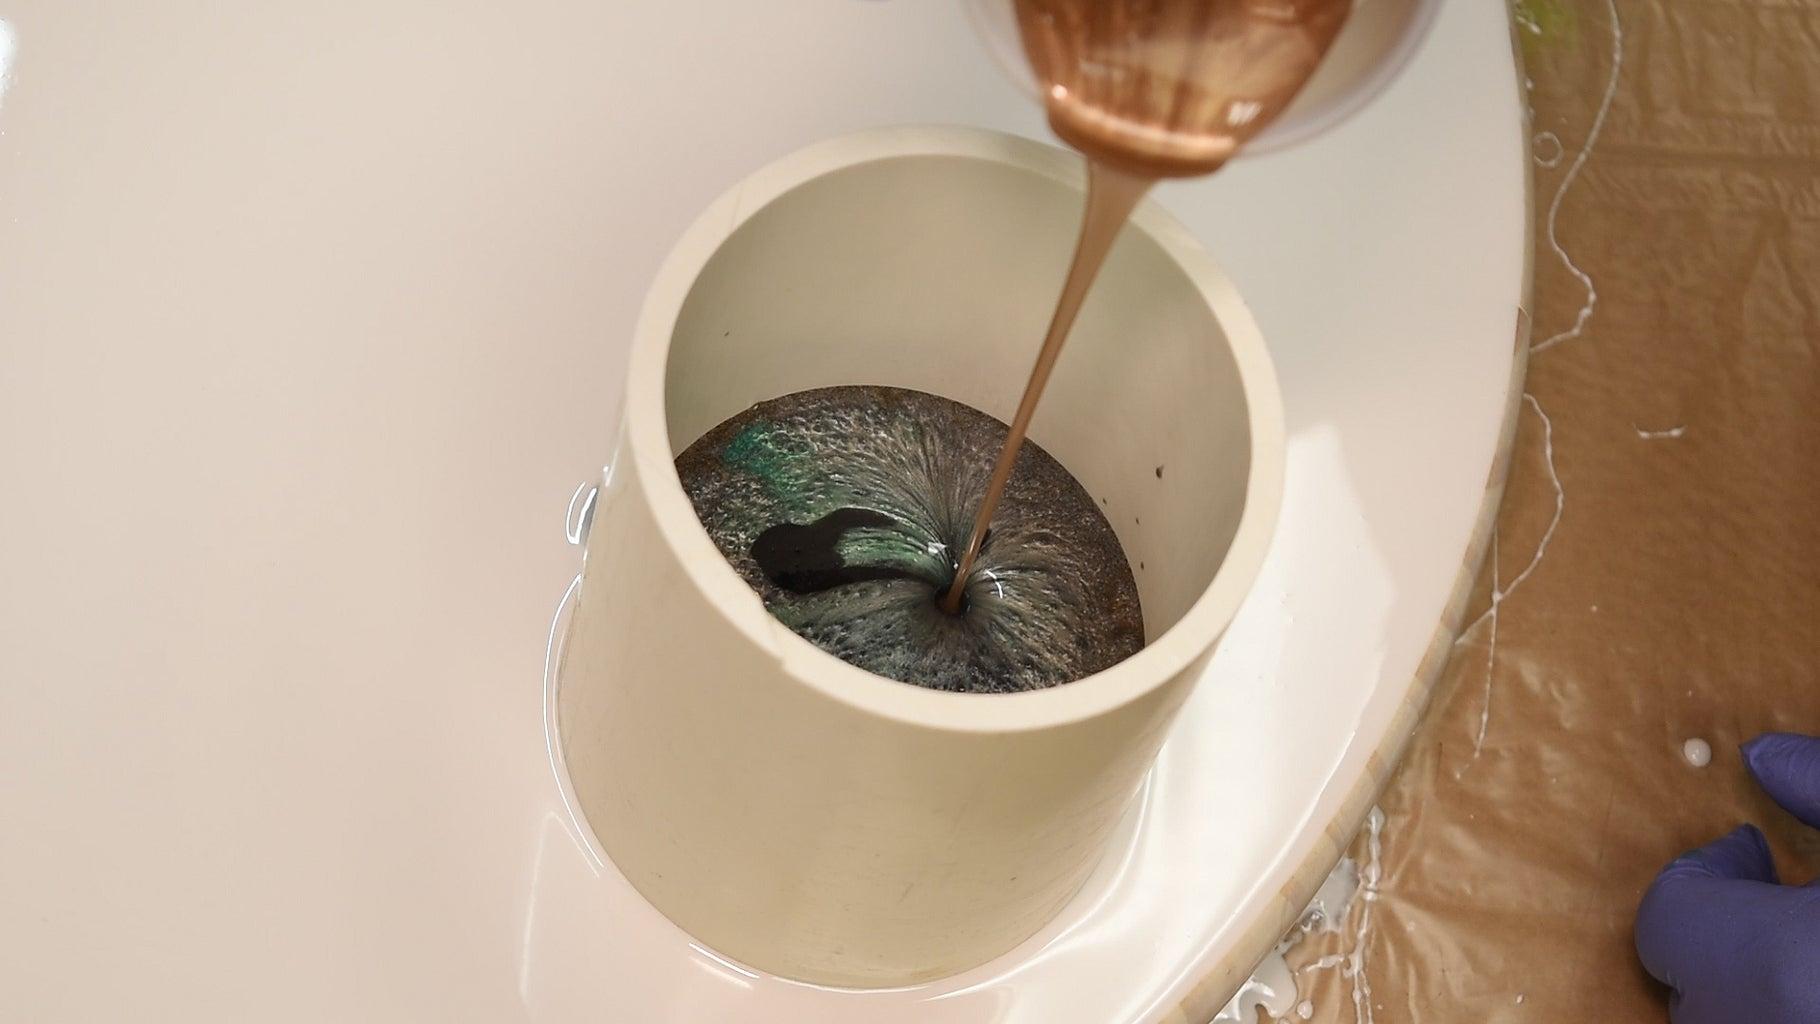 The Second Pour